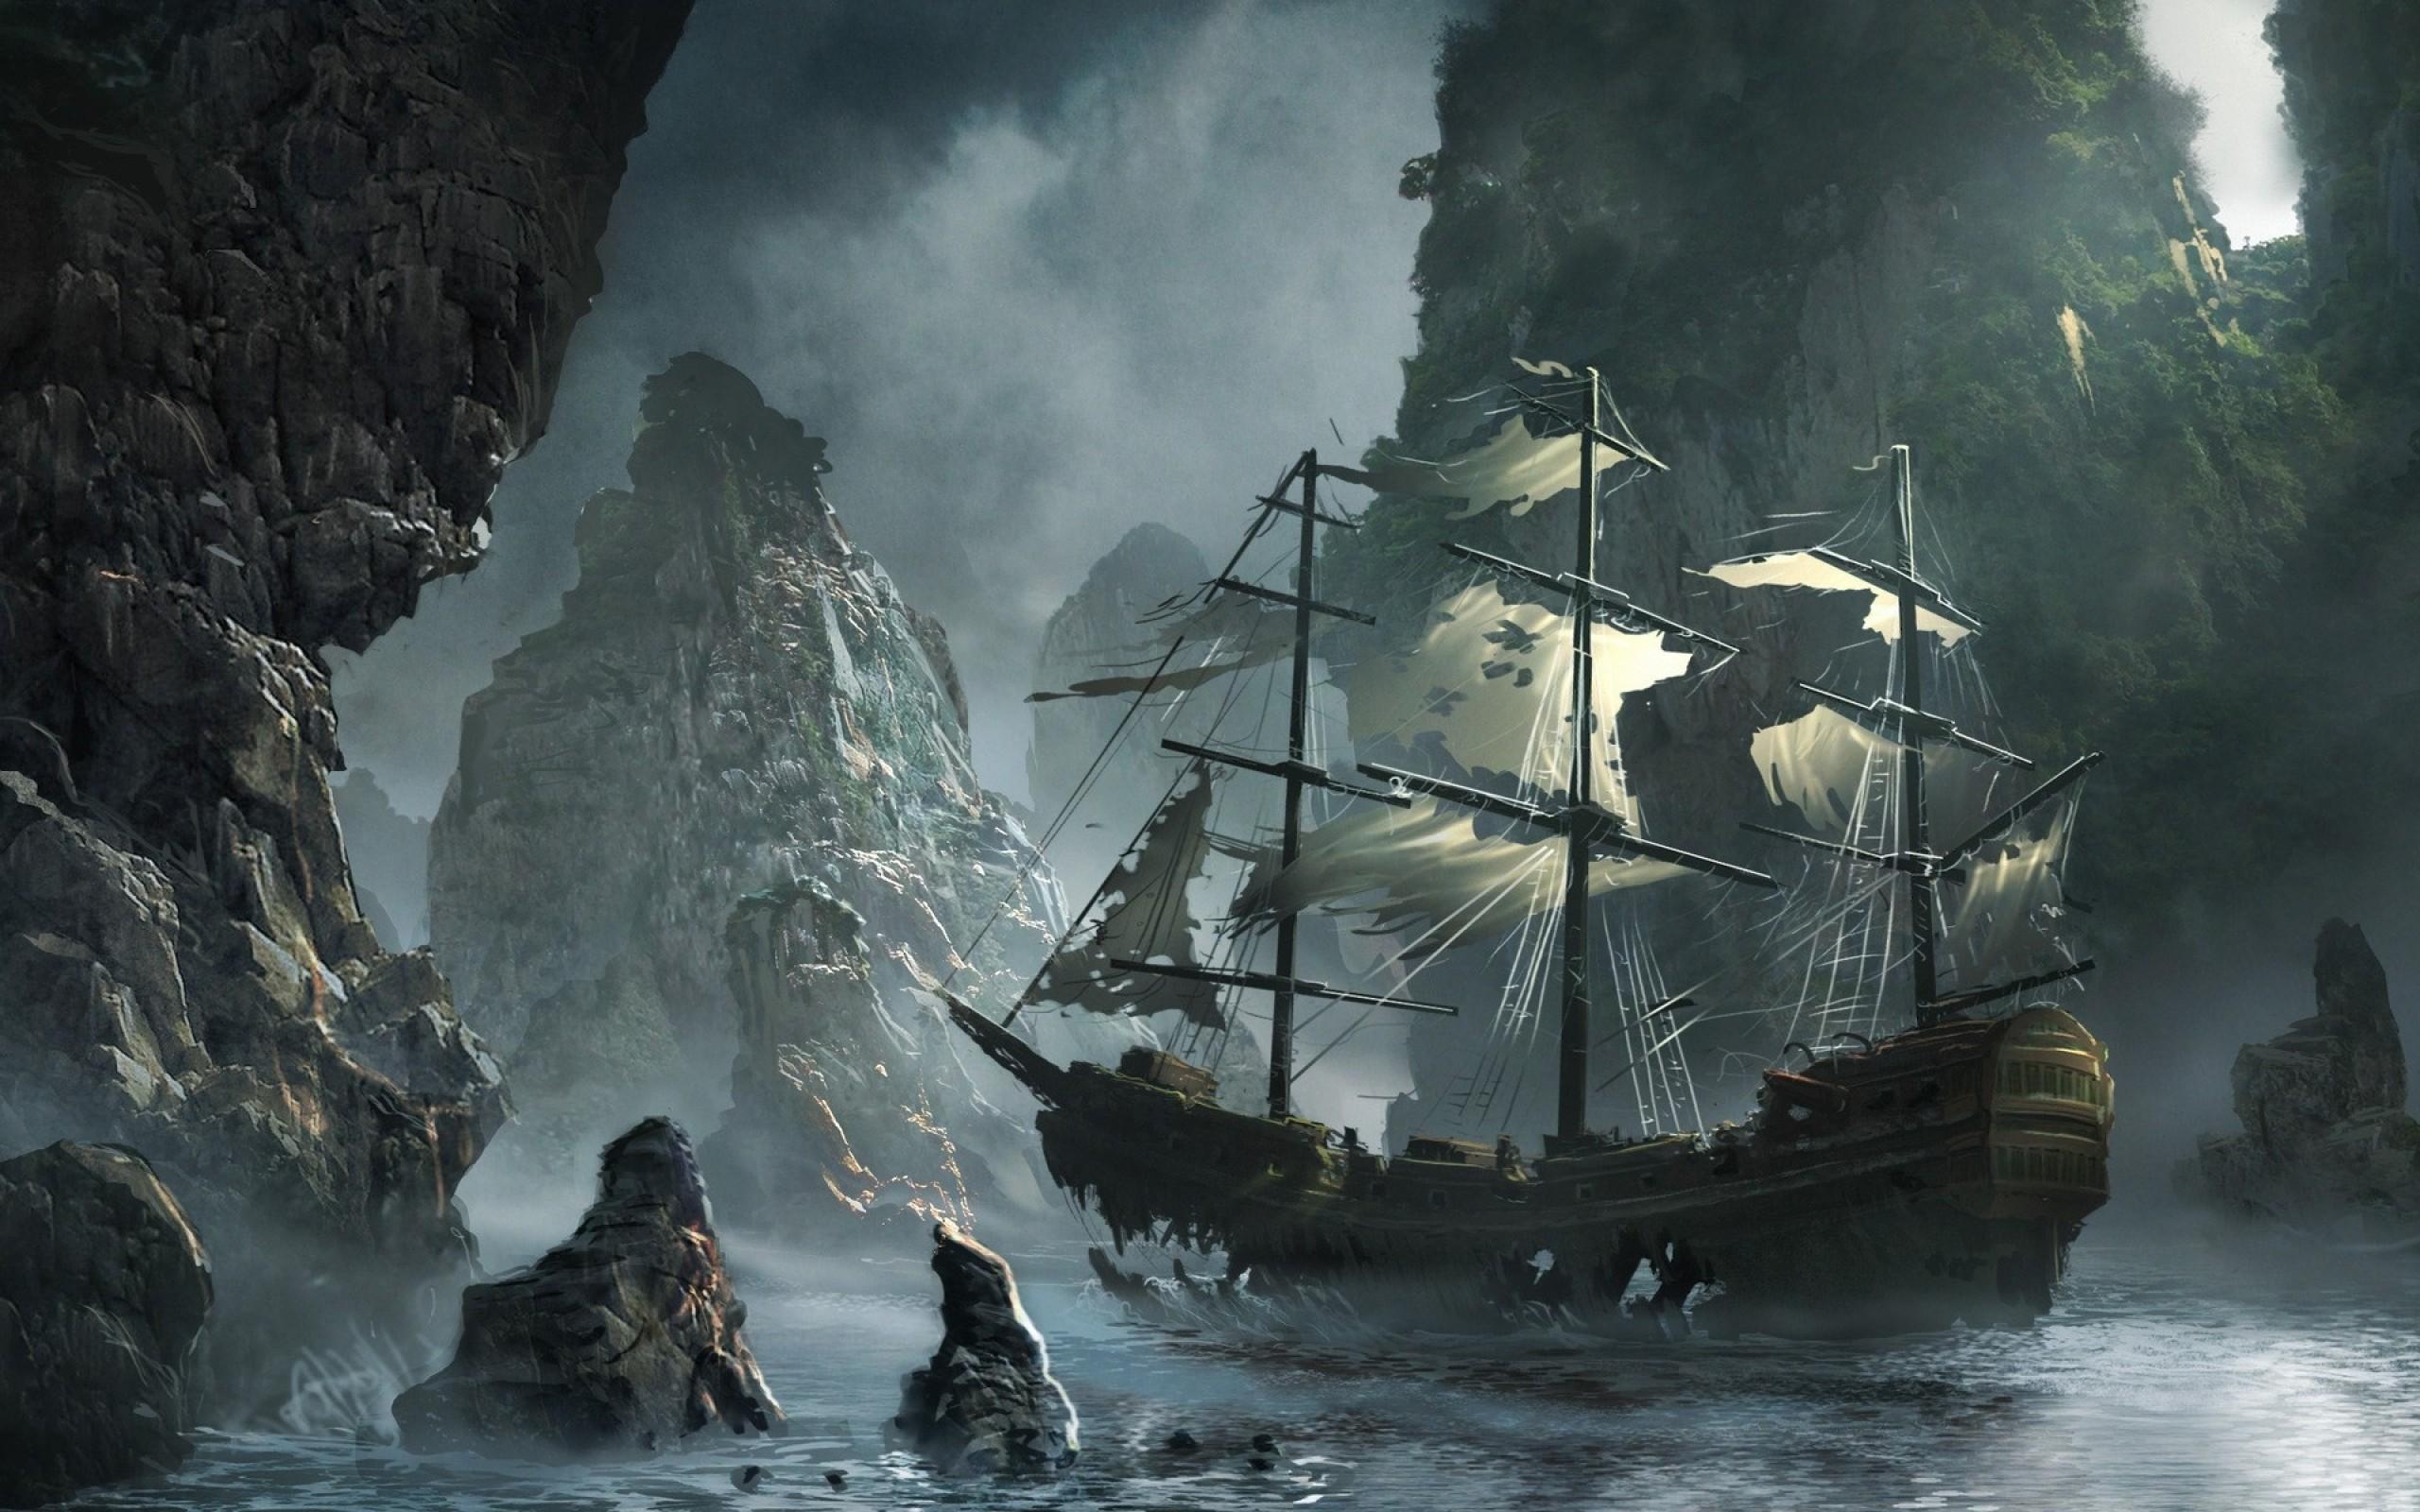 картинка корабль море скалы собиралась сделать